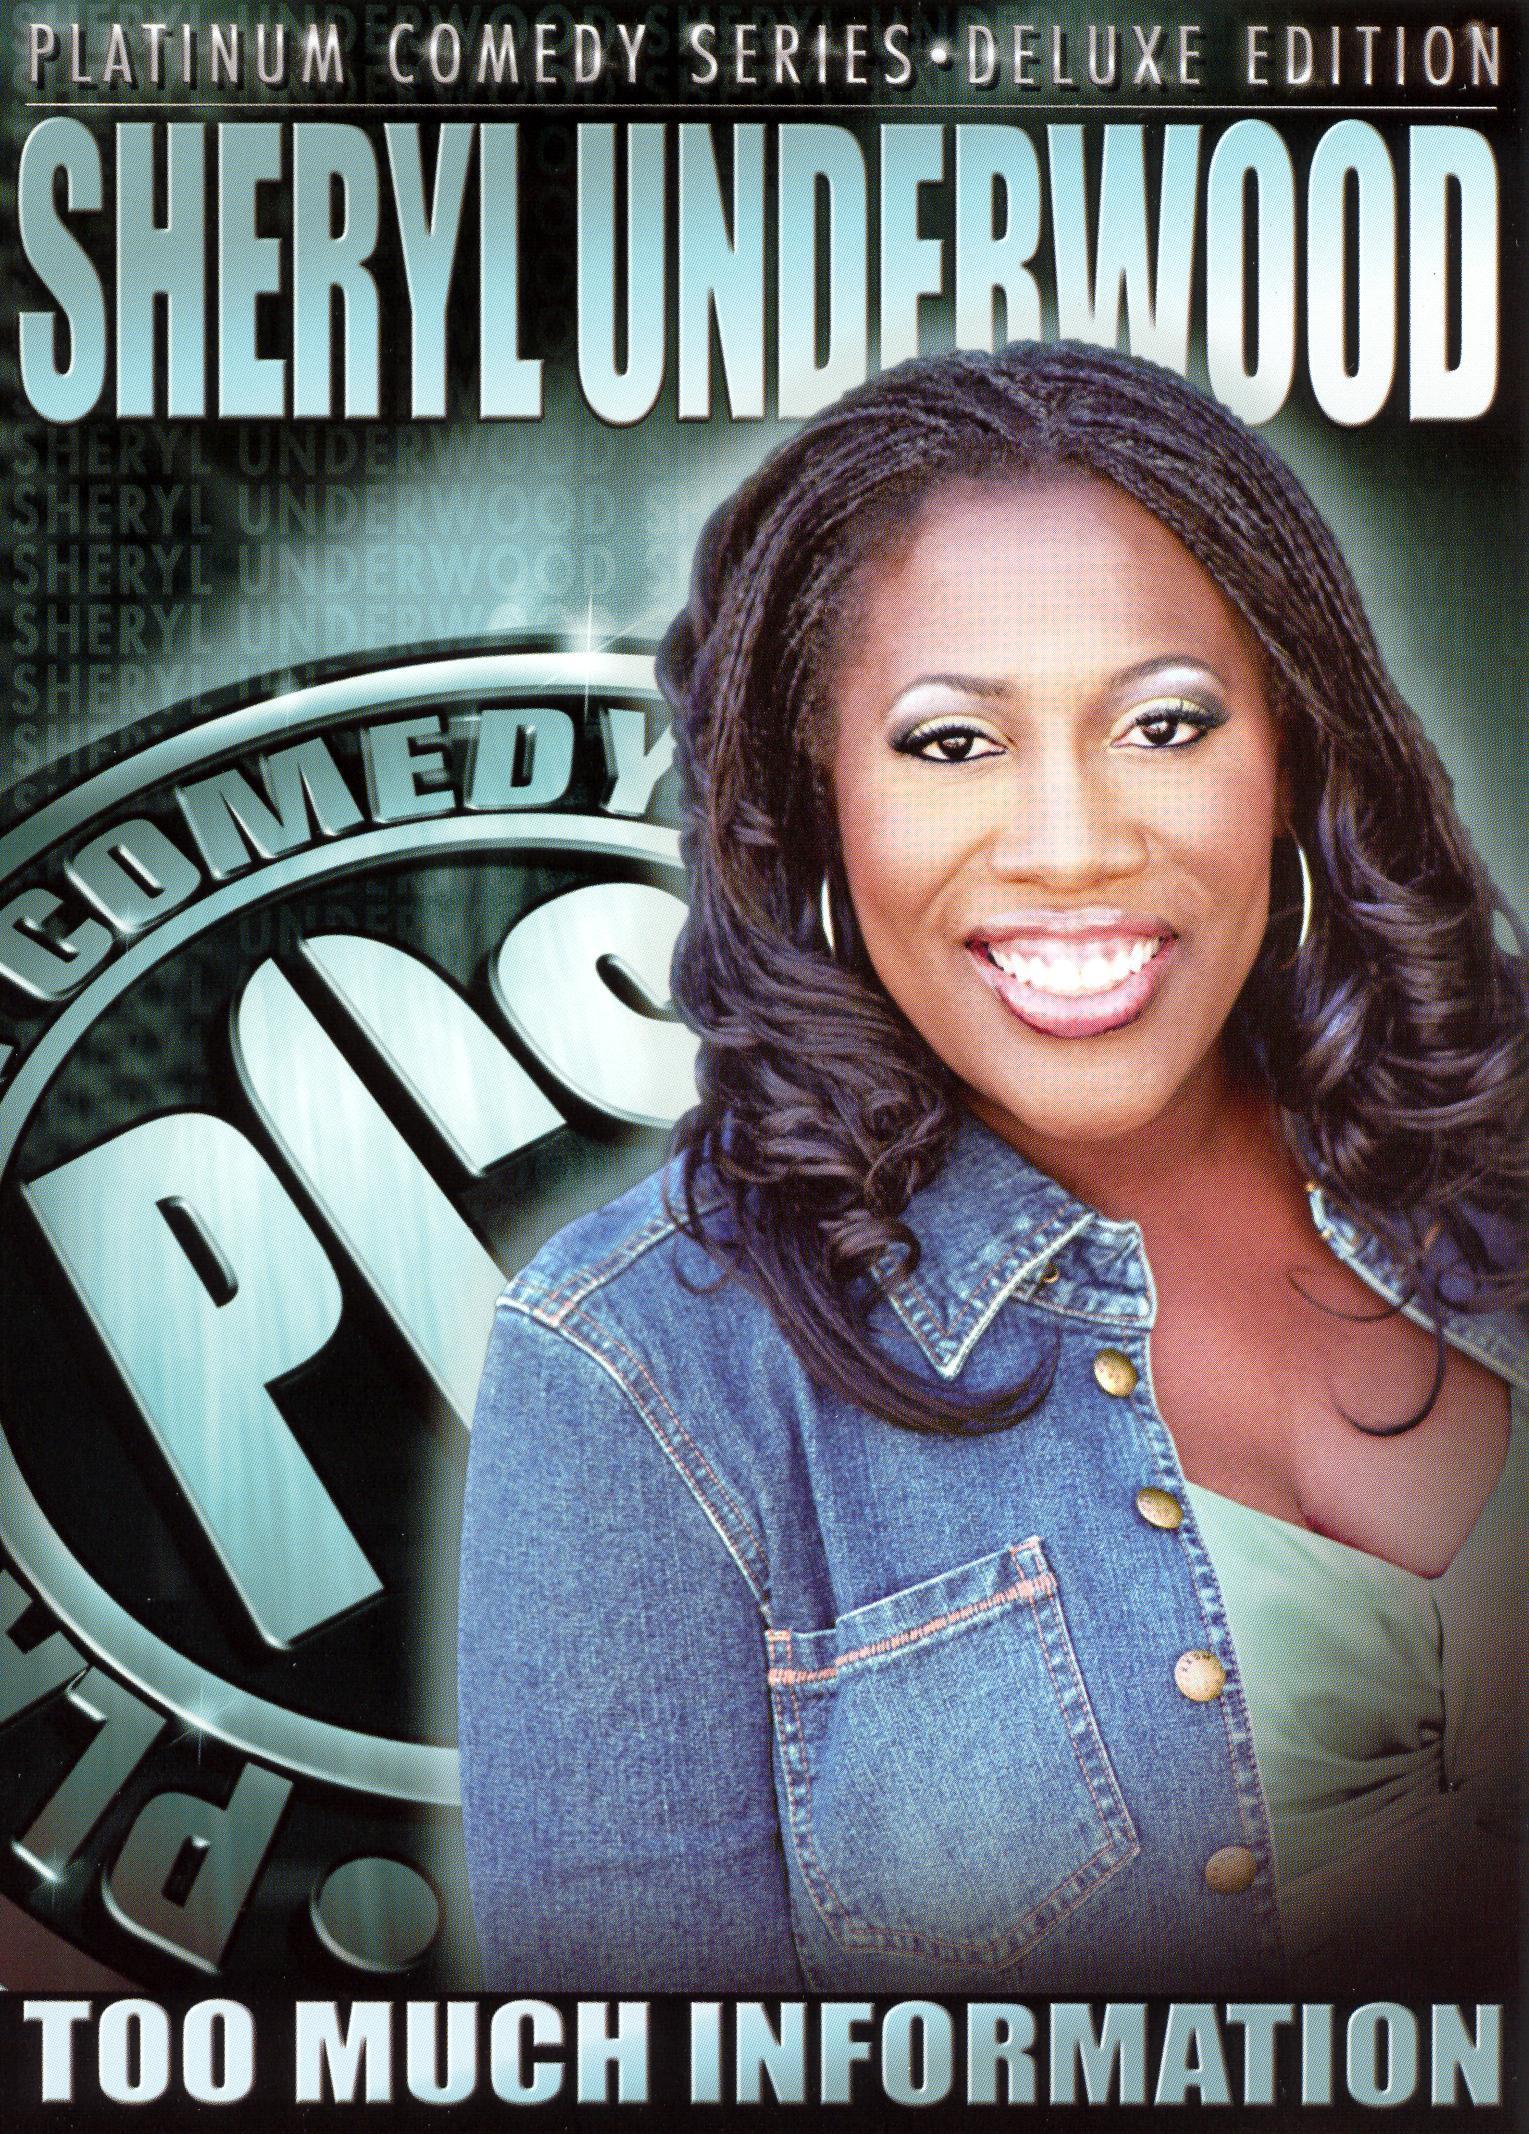 Platinum Comedy Series: Sheryl Underwood - Too Much Information